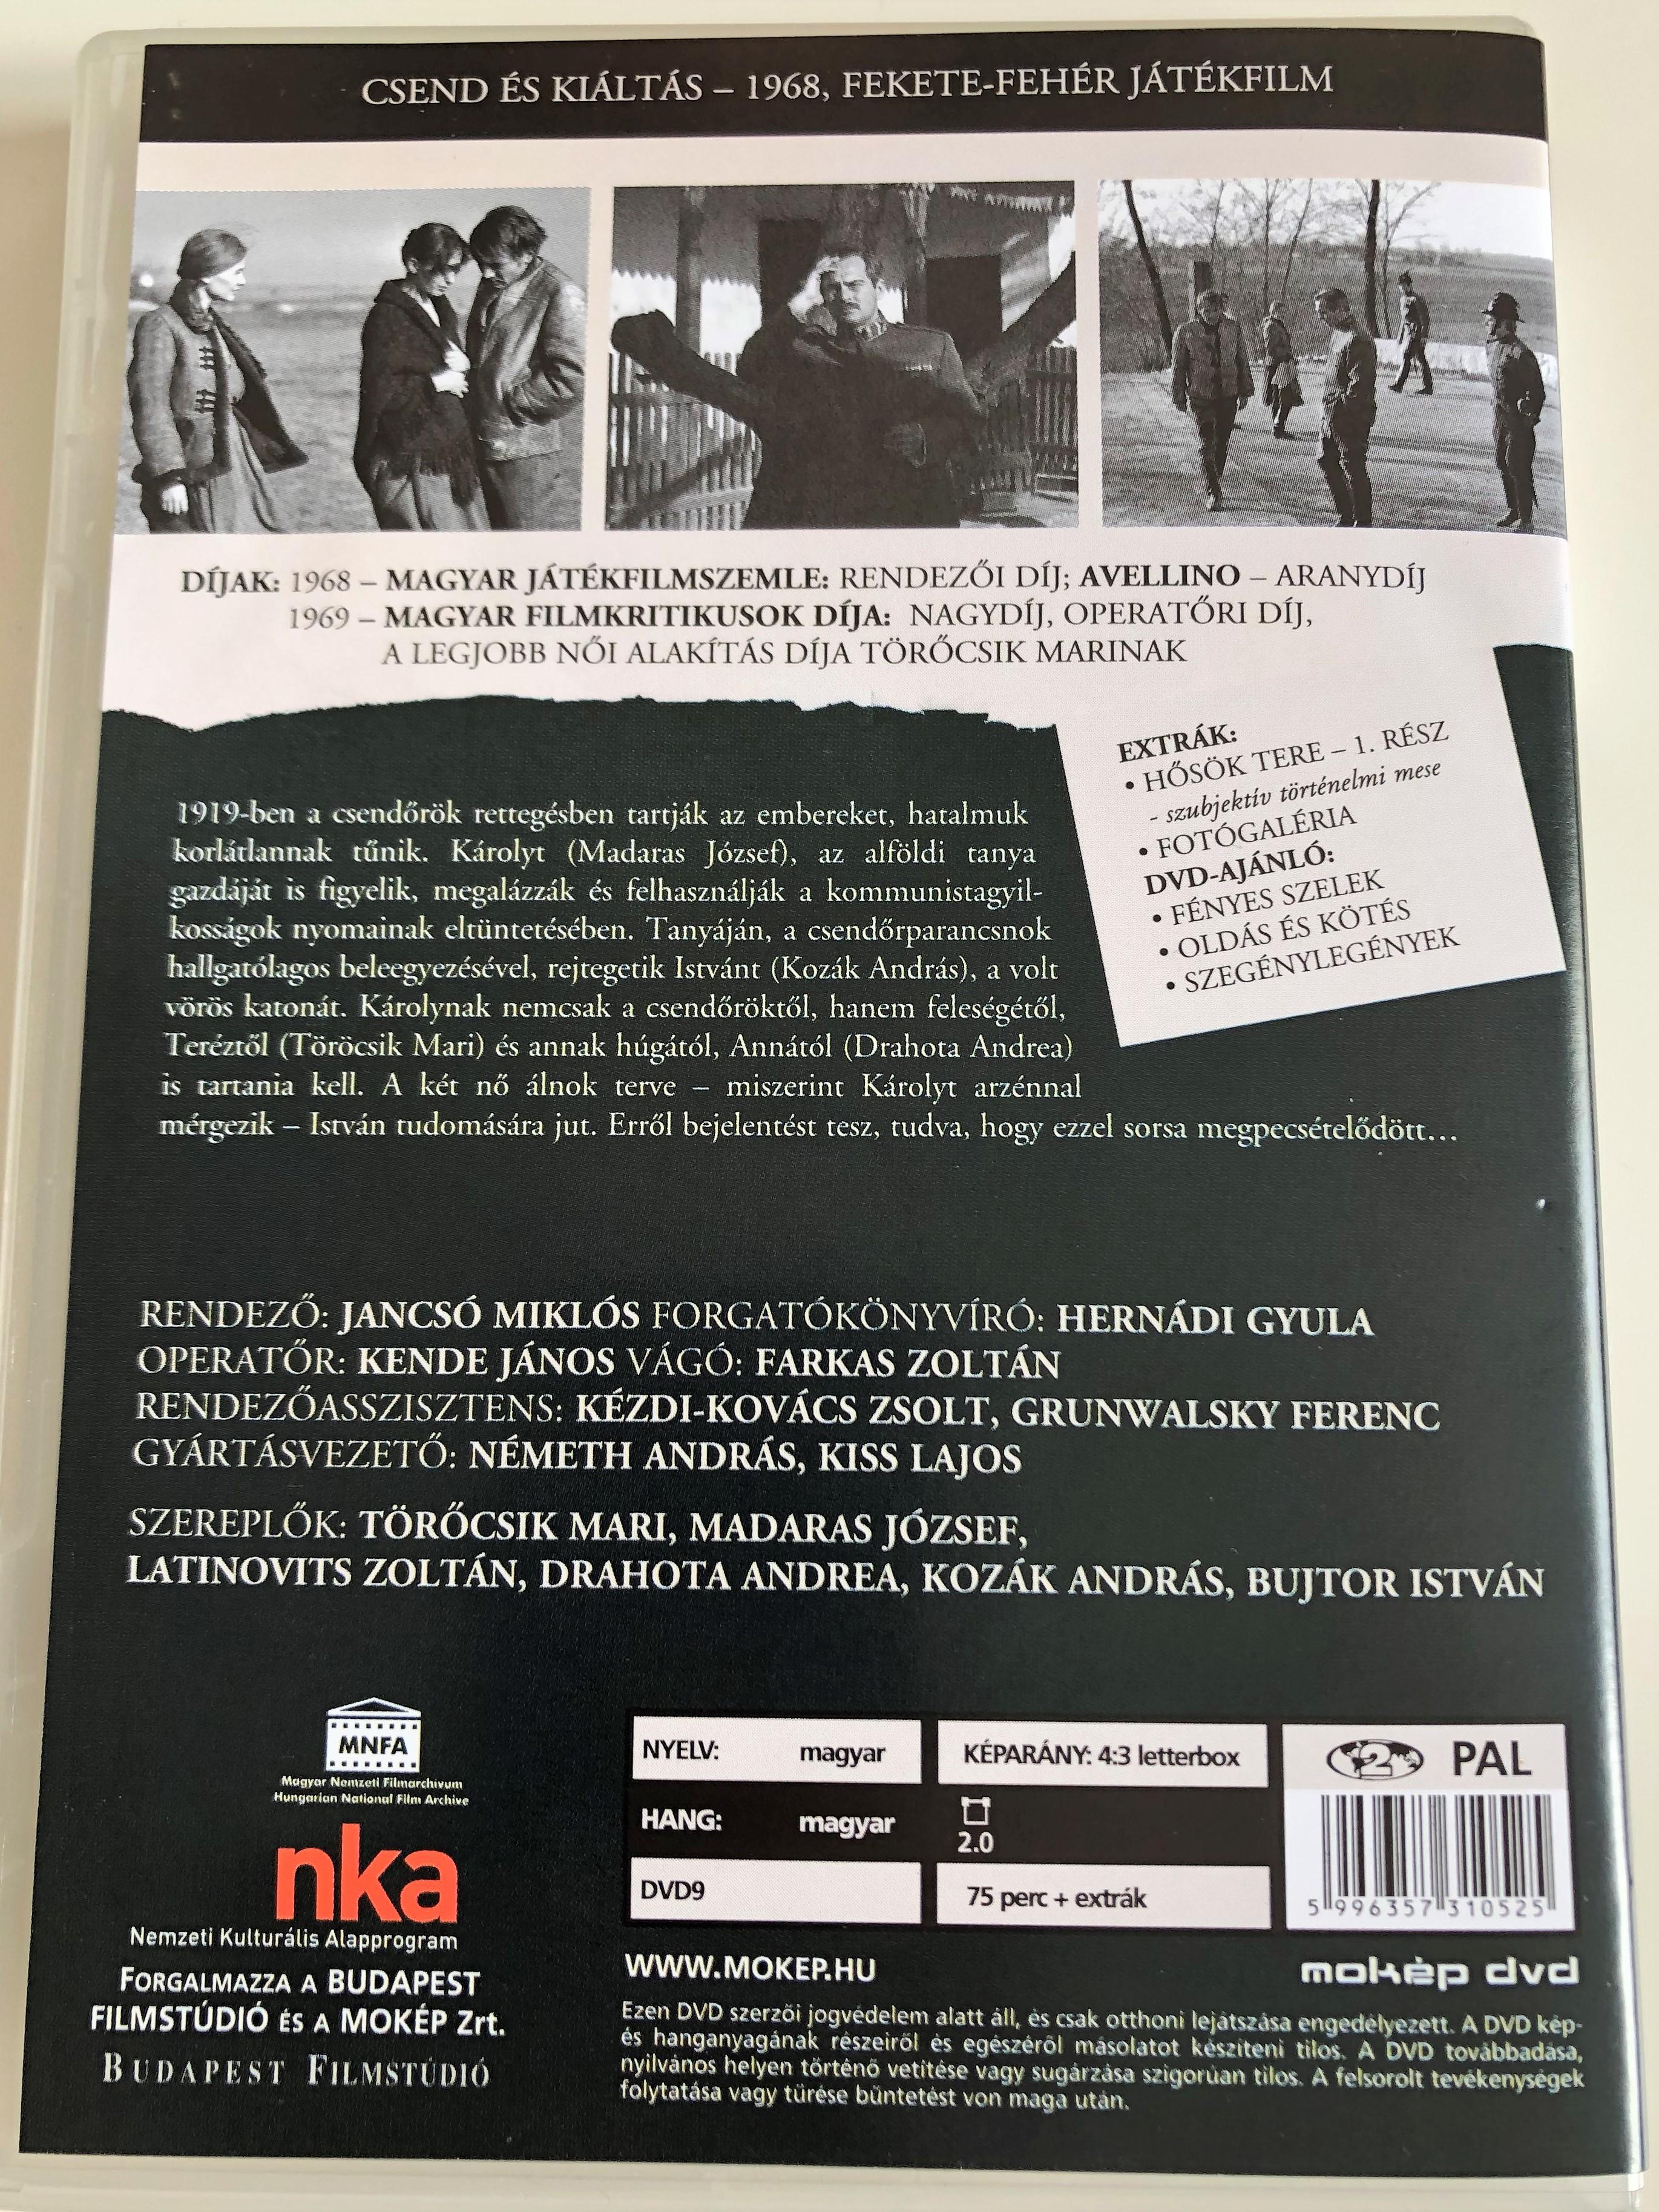 -csend-s-ki-lt-s-dvd-1968-silence-and-cry-directed-by-mikl-s-jancs-starring-koz-k-andr-s-t-r-csik-mari-latinovits-zolt-n-2-.jpg